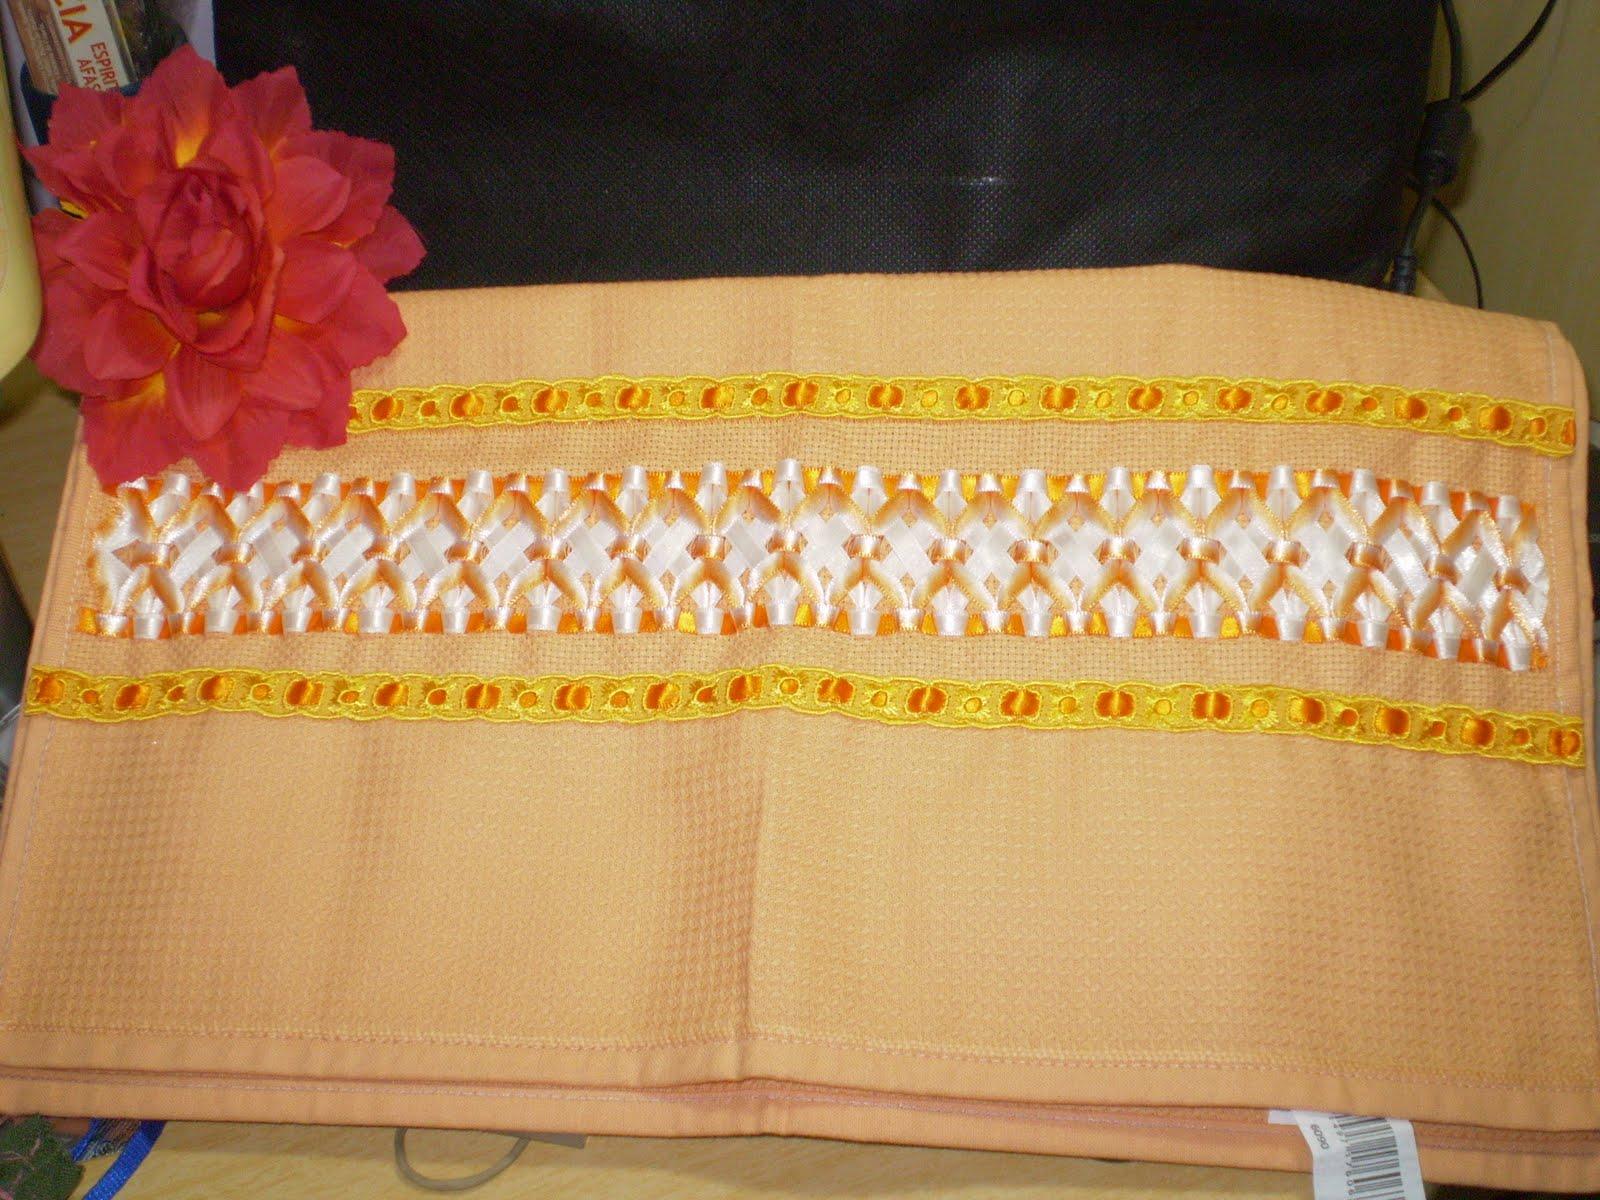 http://1.bp.blogspot.com/_0oHTZCqelVI/TIFwJCRFv_I/AAAAAAAAAf4/V_yMihThjaU/s1600/toalhas+bordadas+de+cozinha+agosto+de+2010+(61).JPG